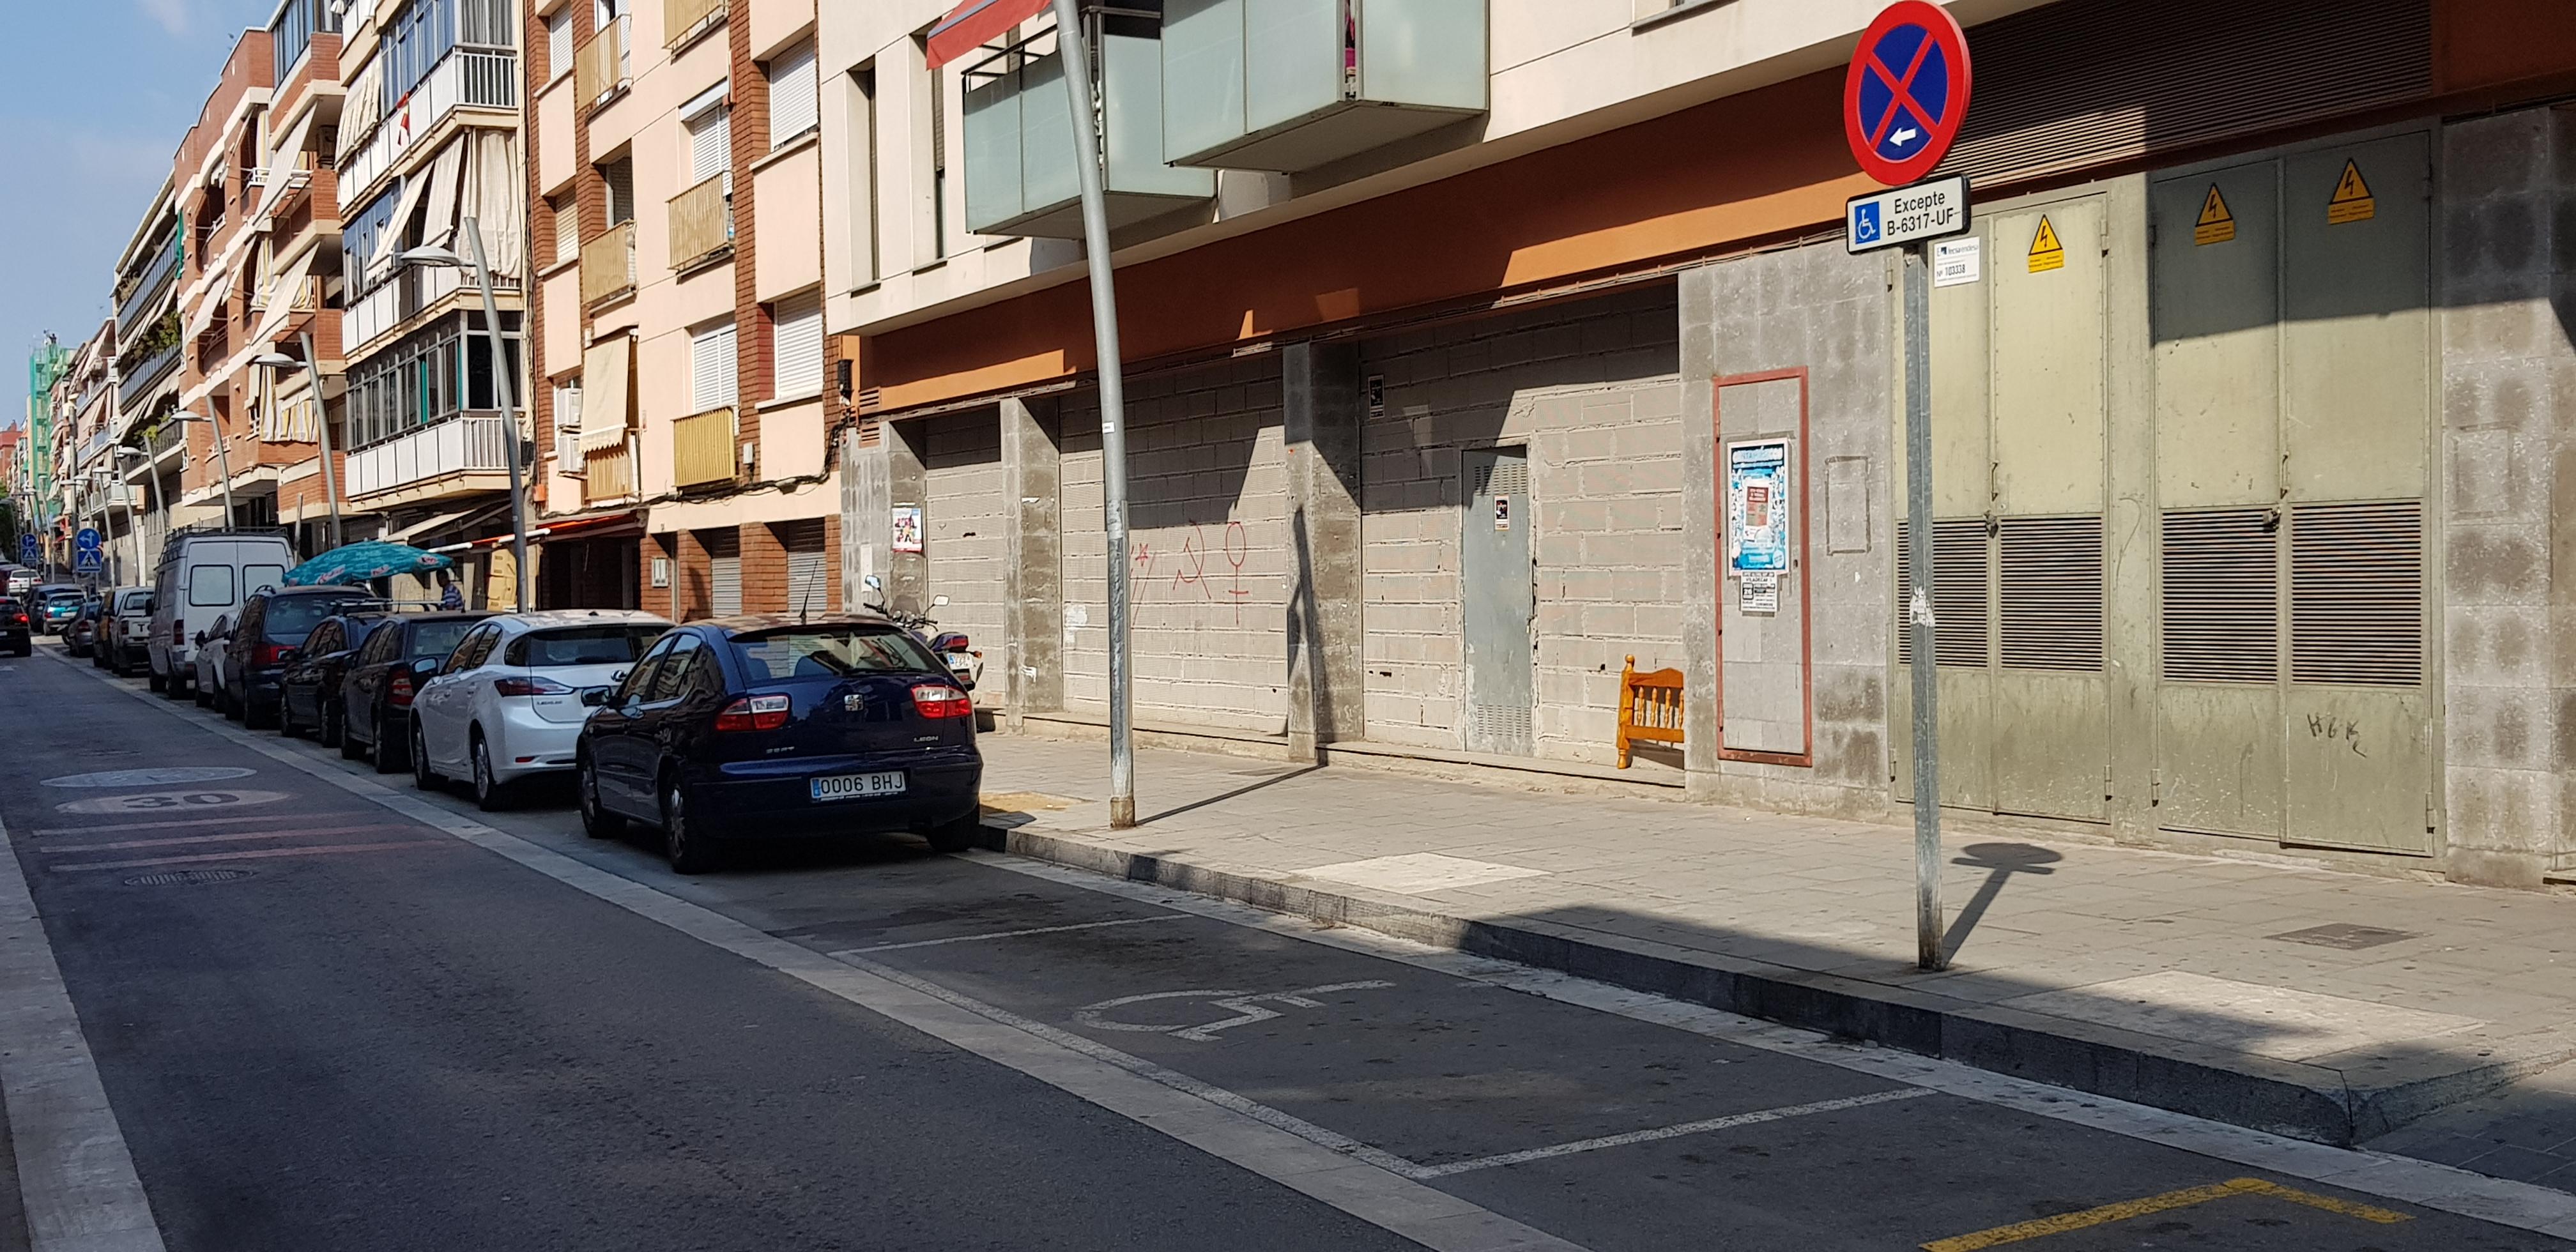 Local en venta en Viladecans, Barcelona, Calle Doctor Auget, 156.000 €, 165 m2